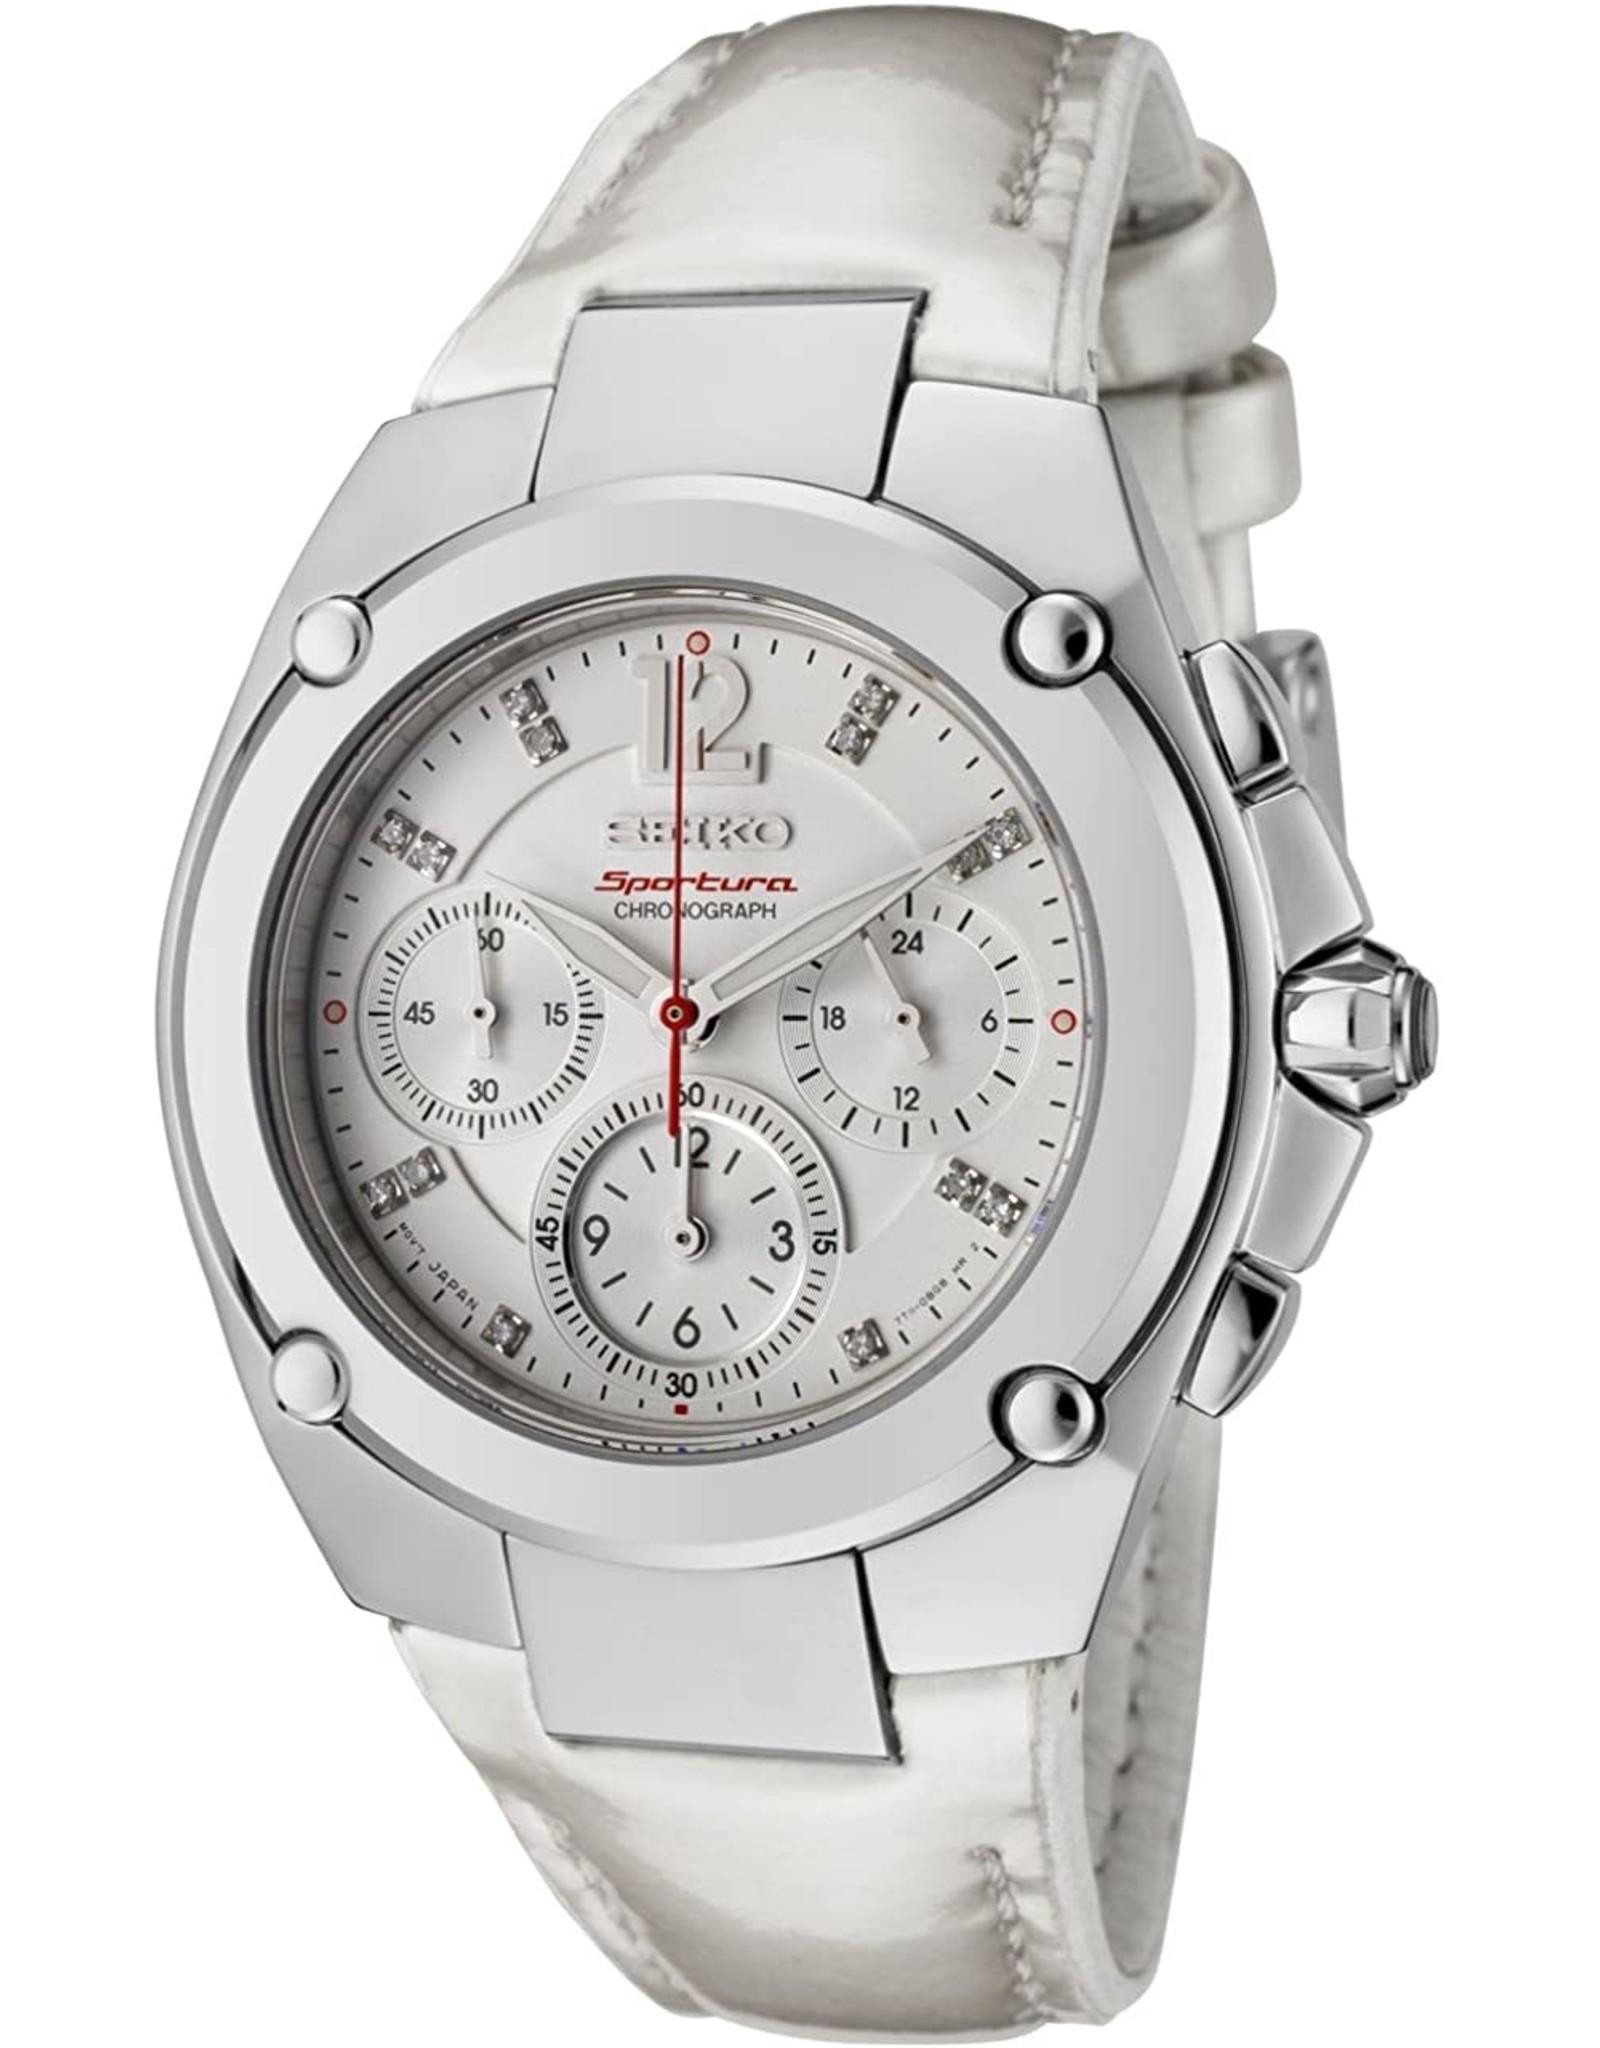 Ladies Seiko Sportura Chronograph Watch with Diamond Dial , 38mm